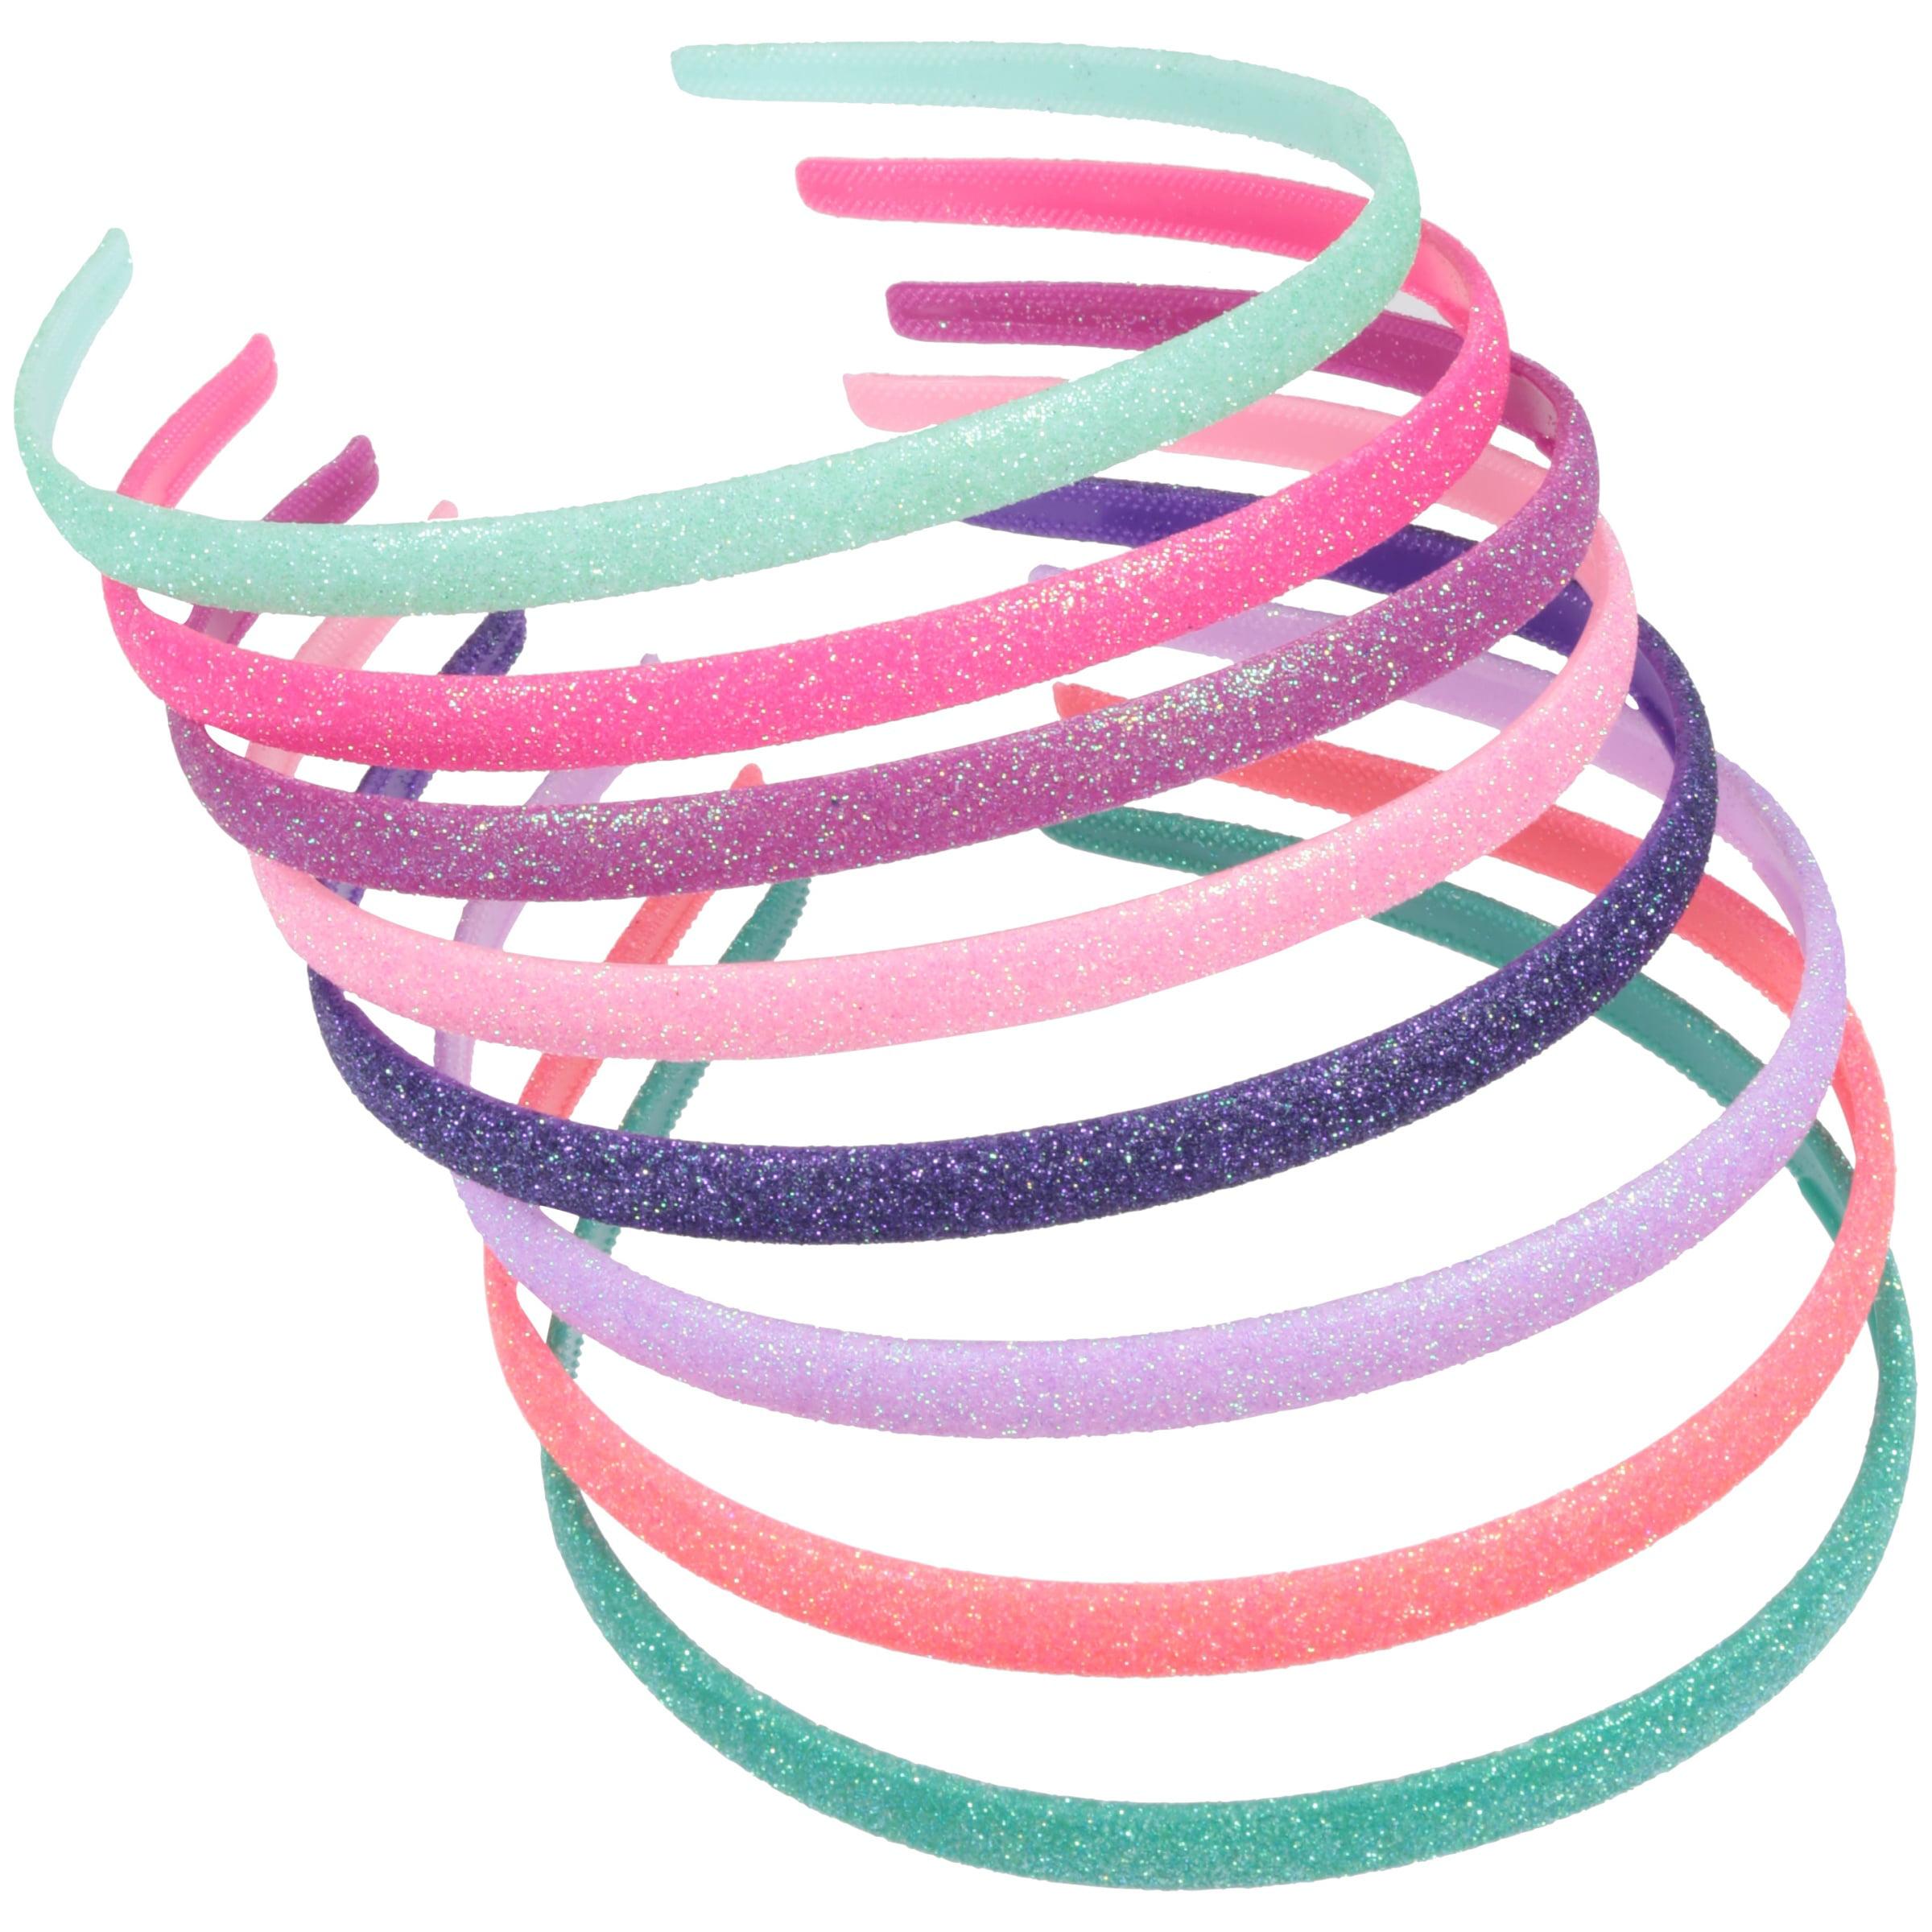 Headbands 8 ct Pack